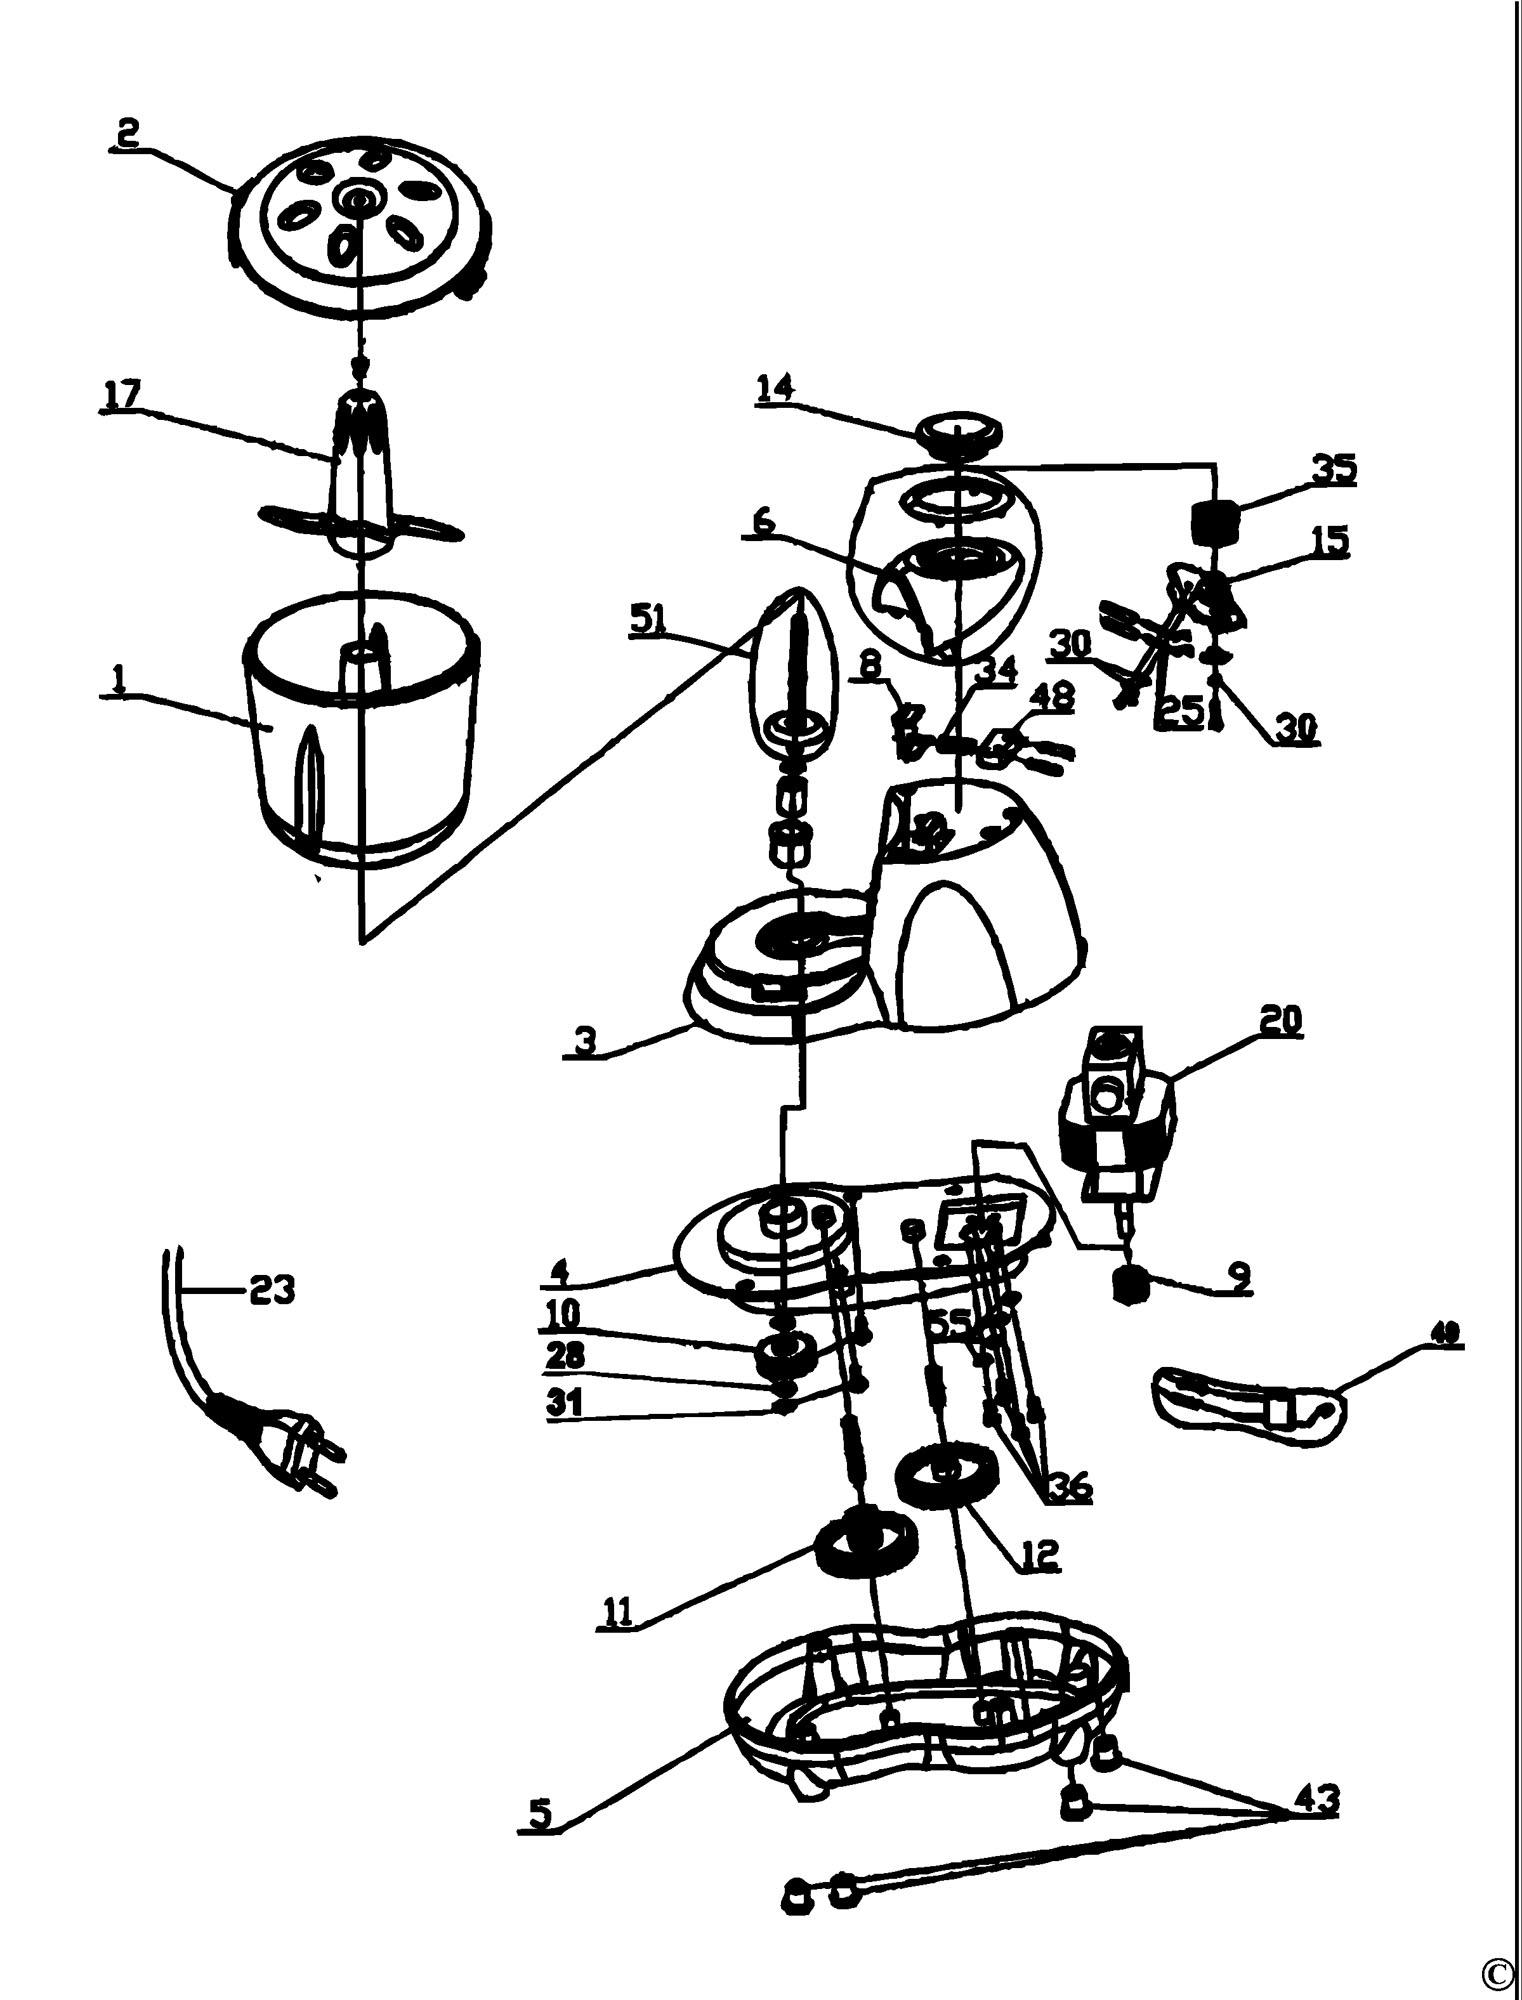 wiring diagram for 1994 yamaha virago 1100 1994 yamaha